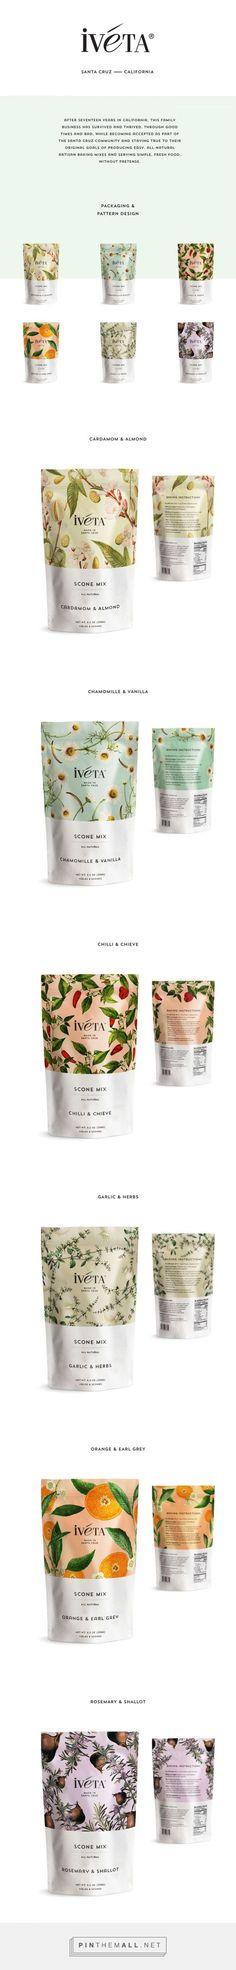 IVETA Scone Mix Packaging by Alvarez Juana | Fivestar Branding Agency – Design and Branding Agency & Curated Inspiration Gallery